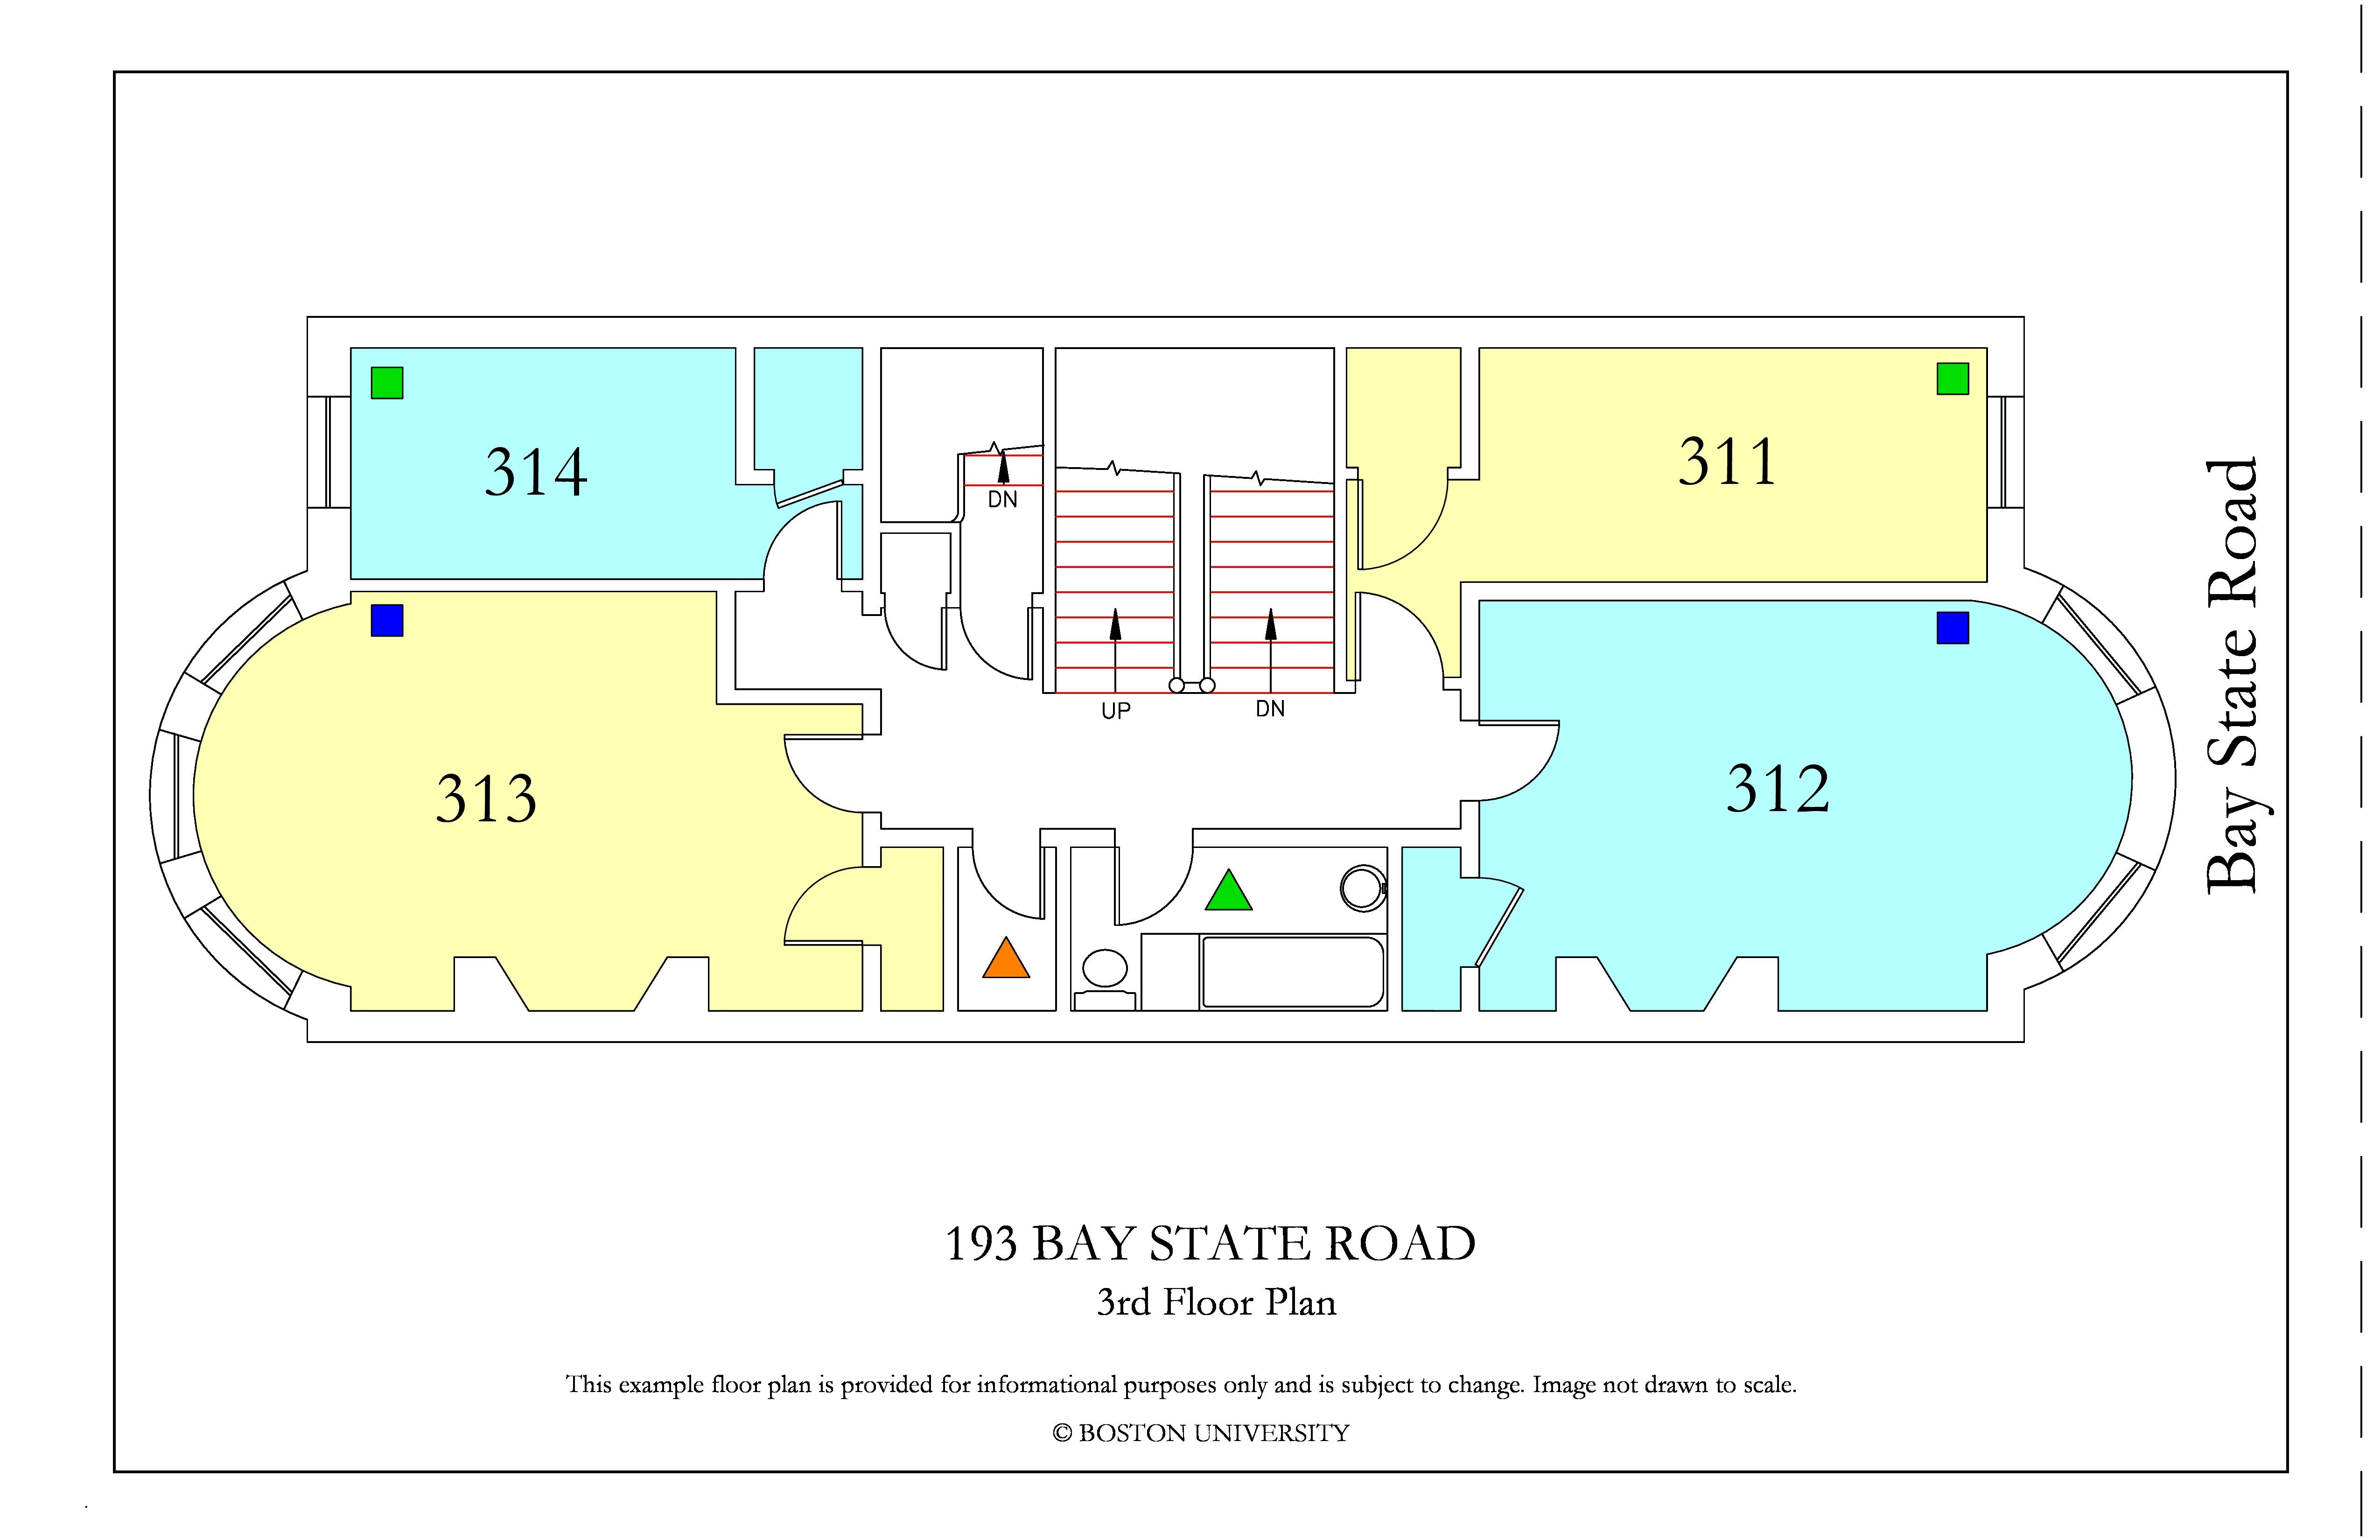 193 Bay State Road_3rdFloor